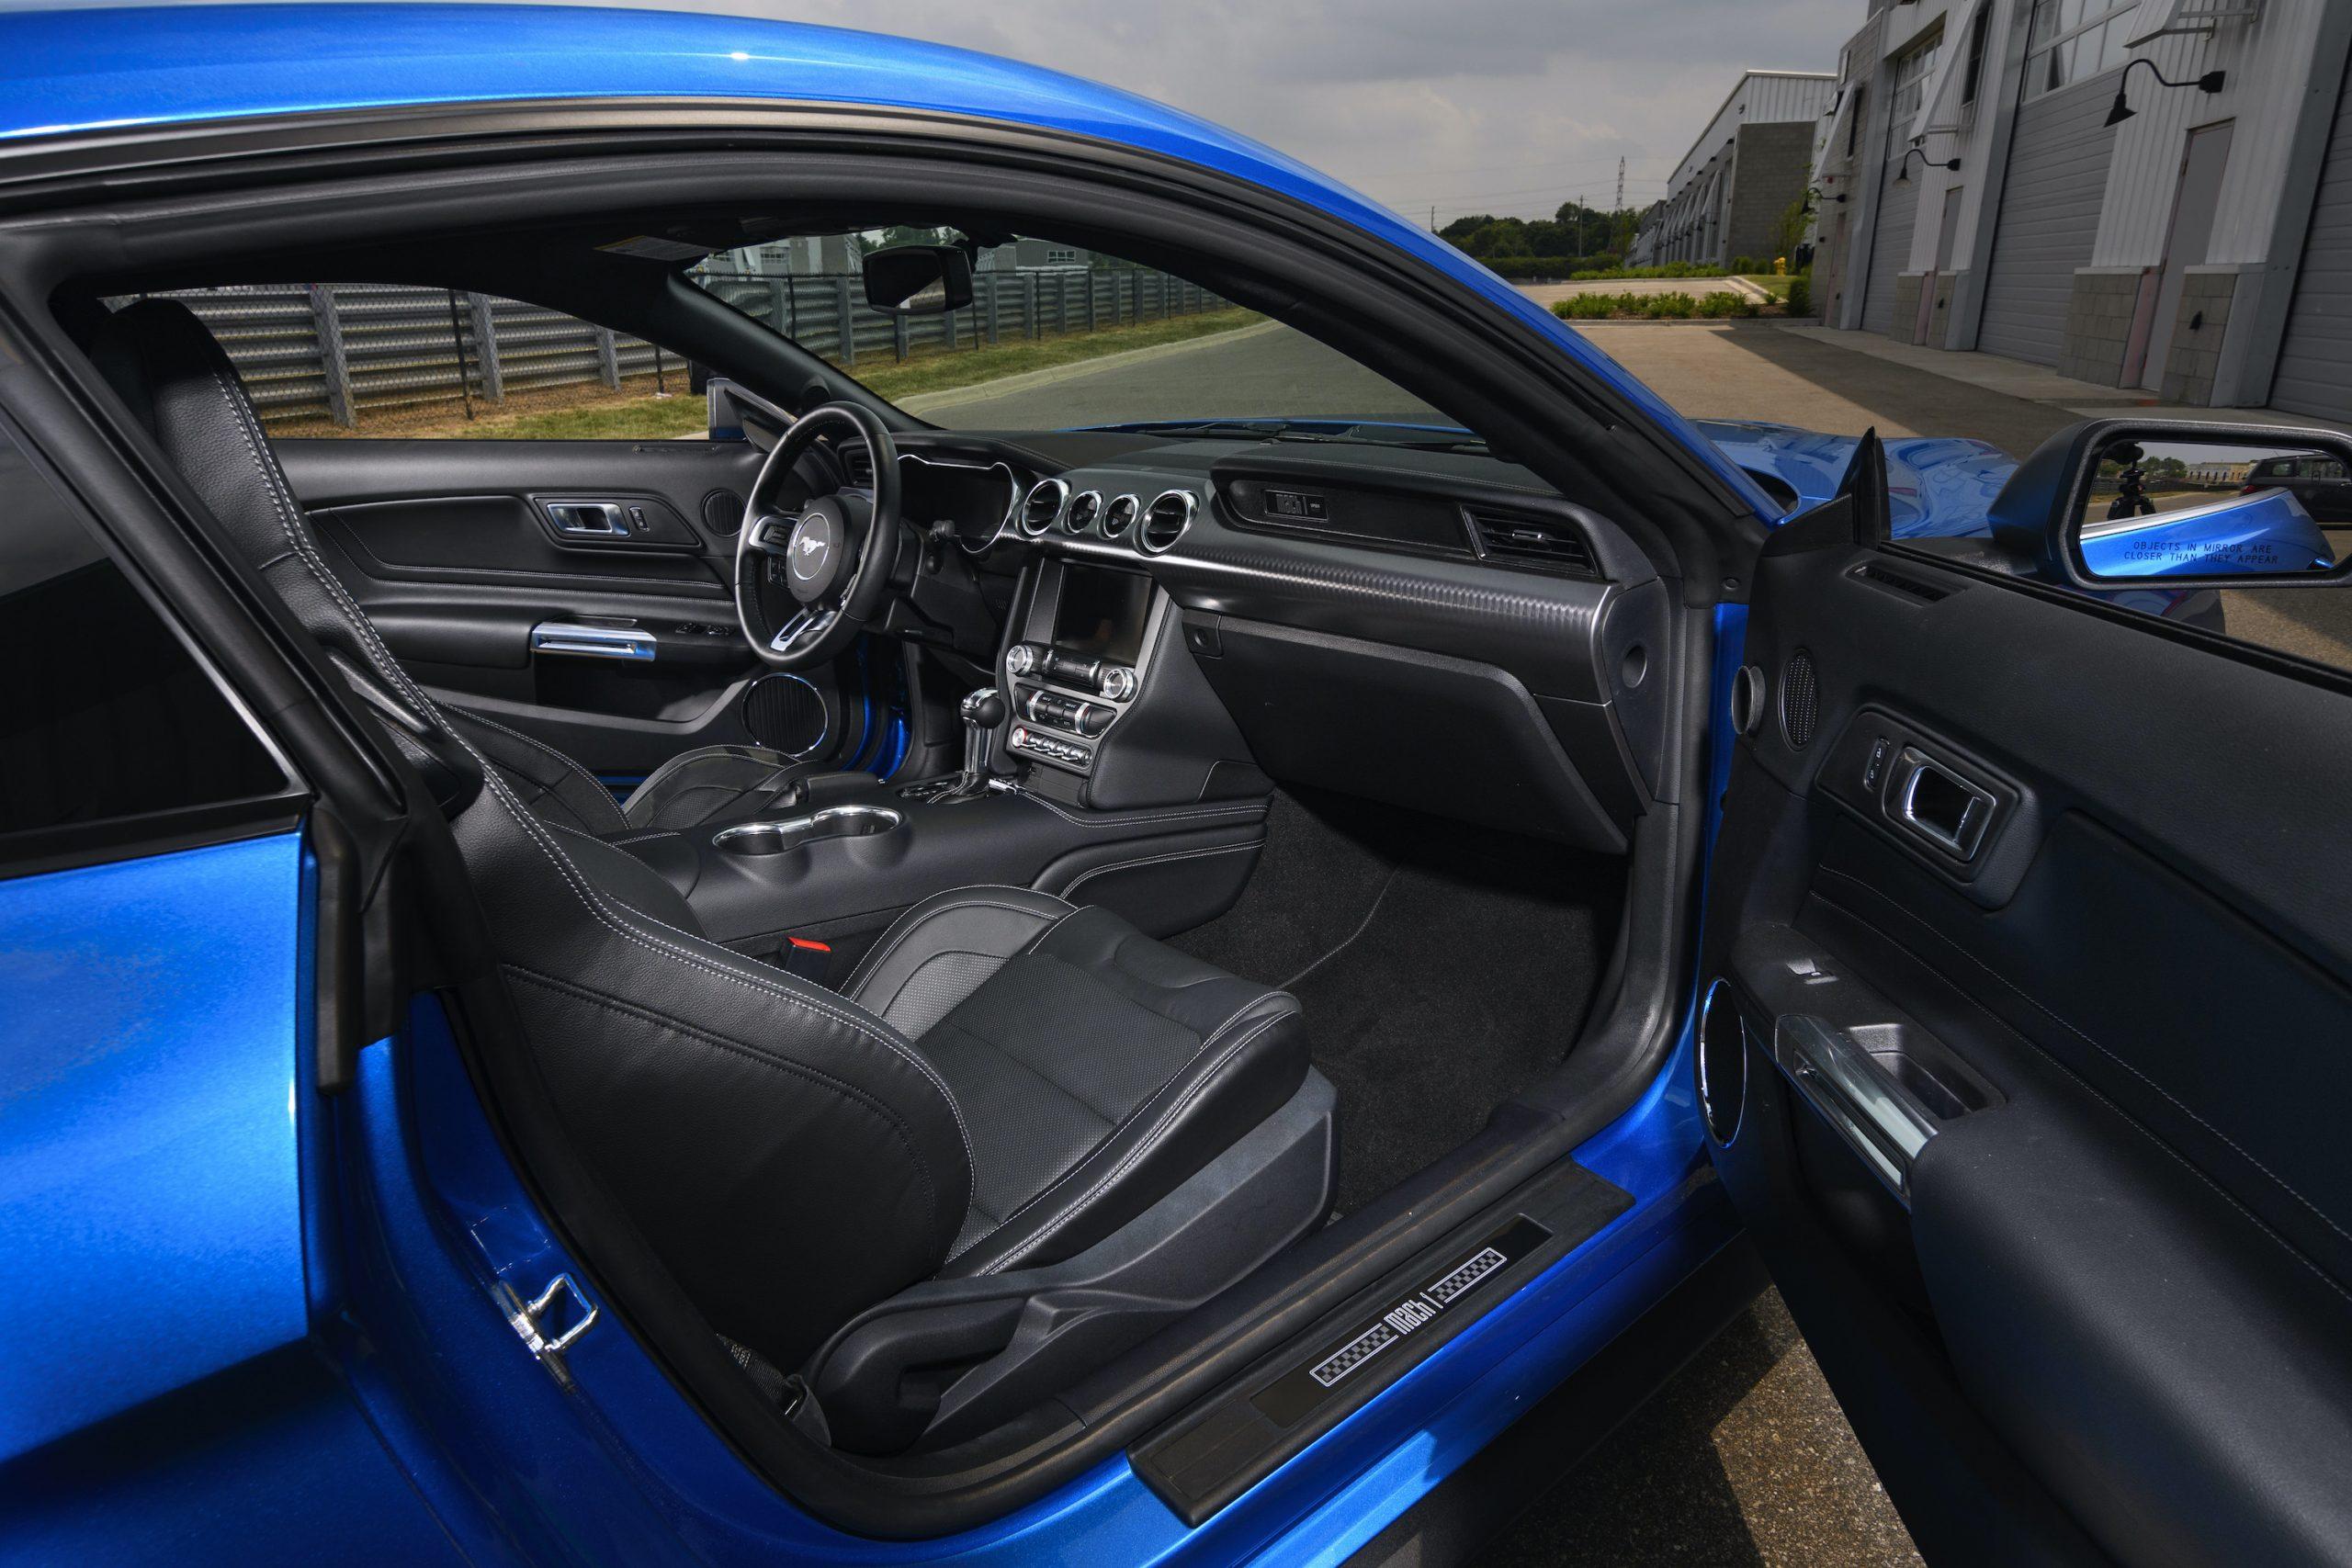 2021 Ford Mustang Mach 1 inside interior